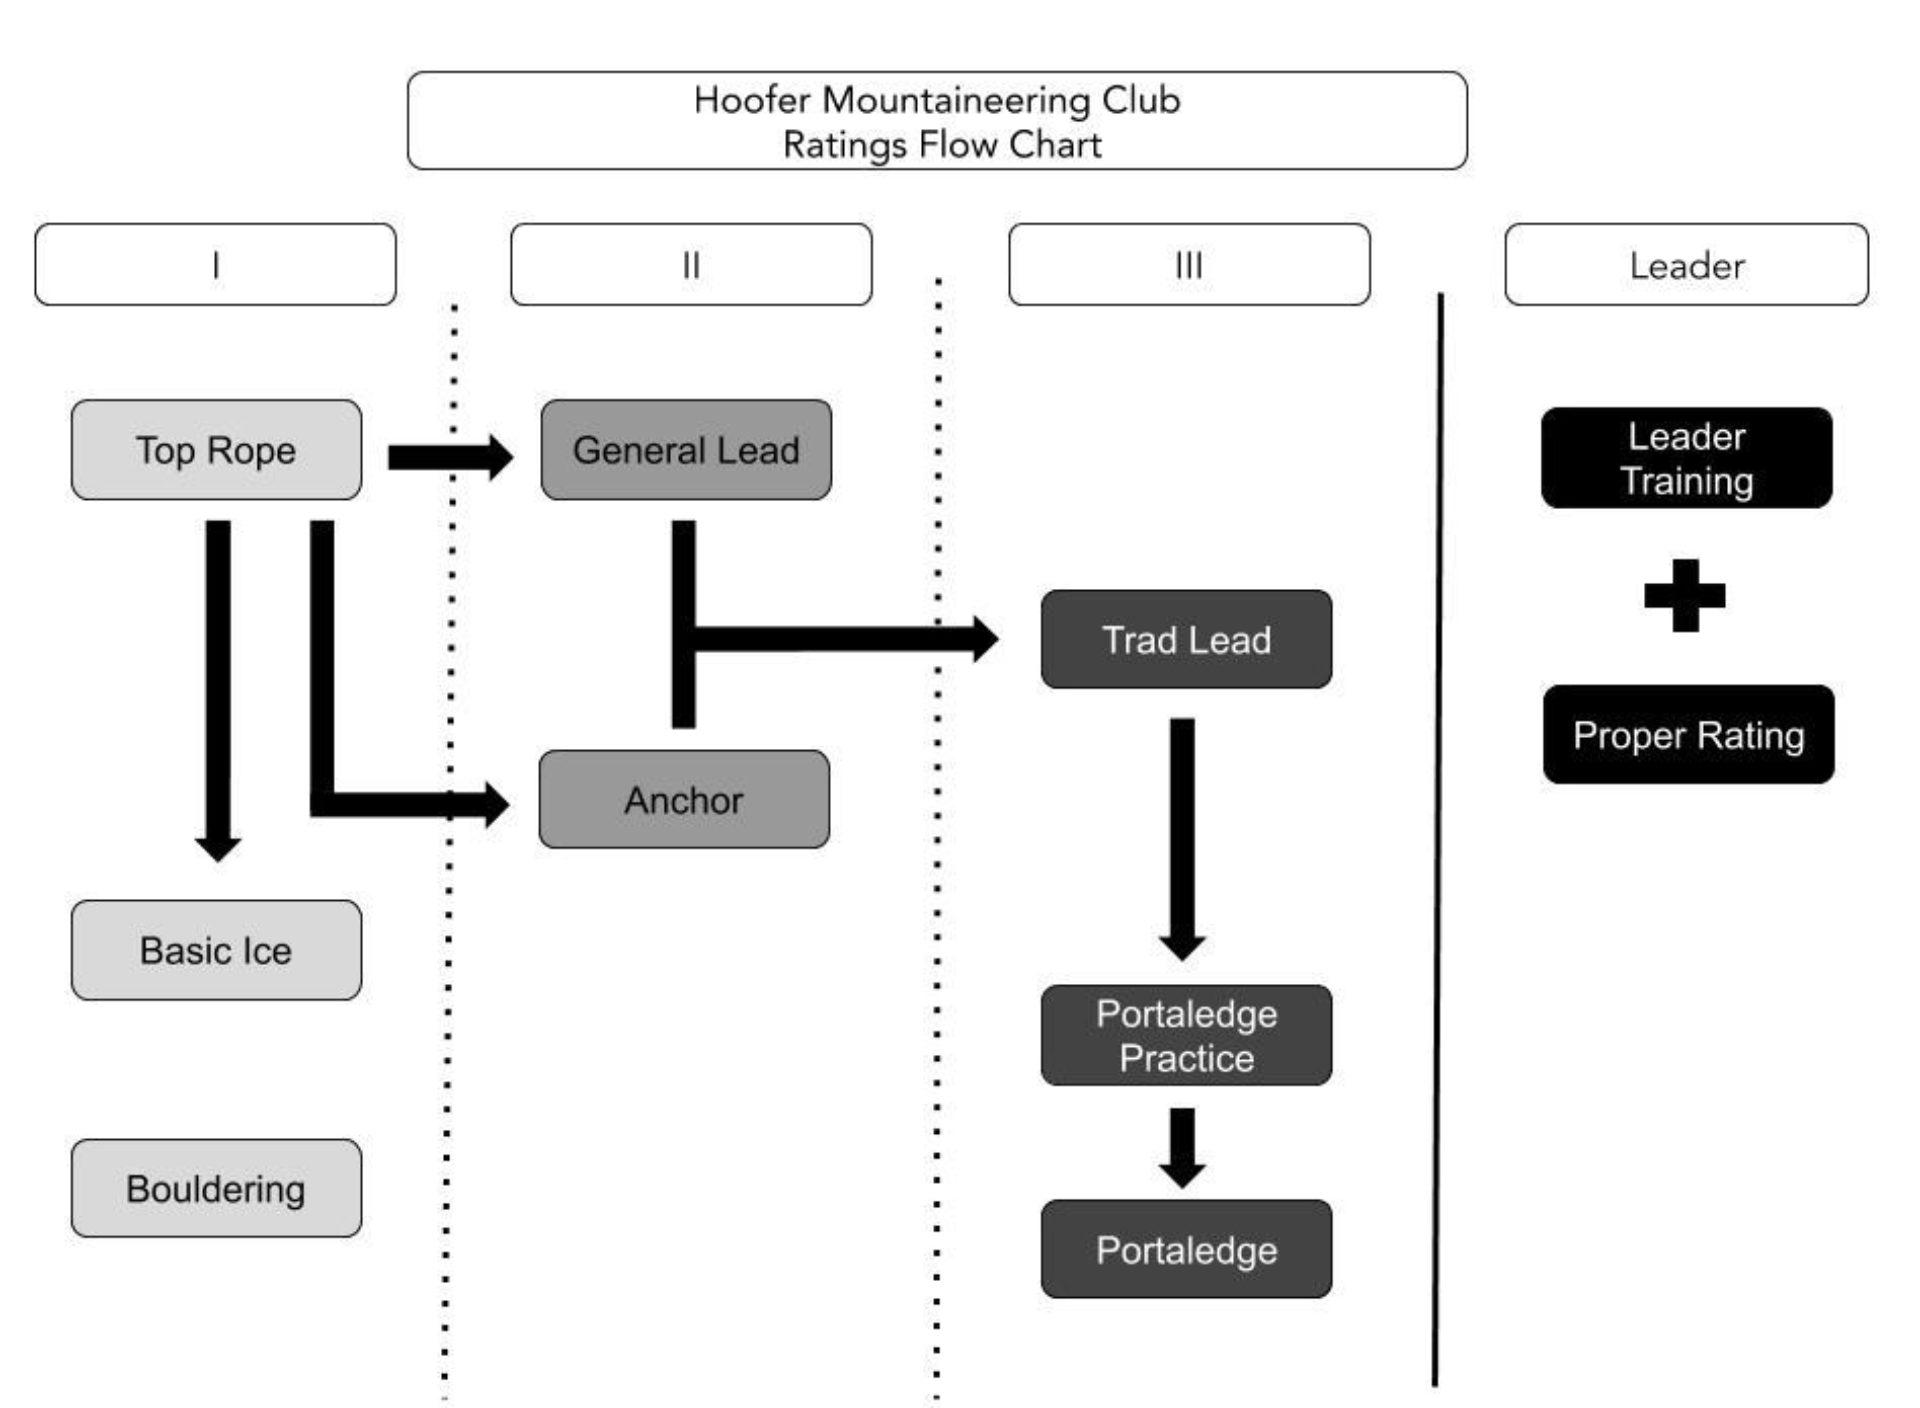 1 Ratings Flow Chart